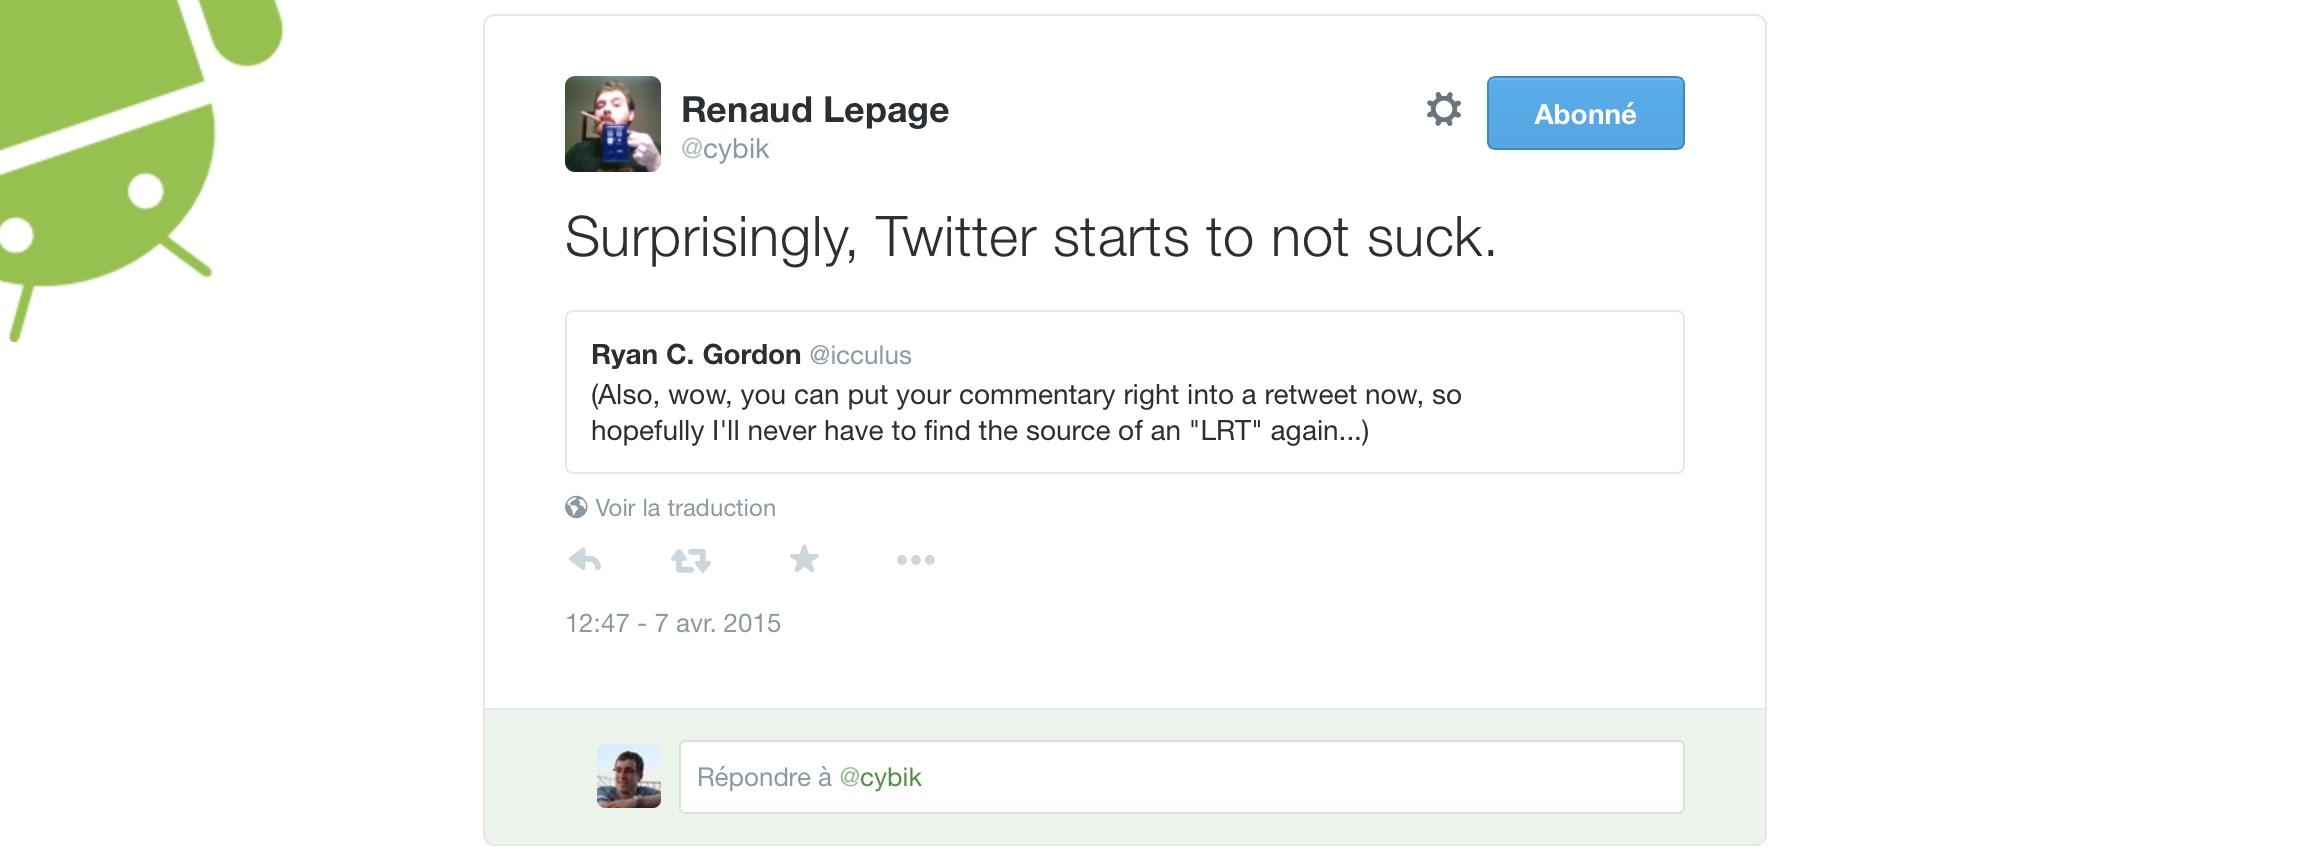 Twitter - Nouveau Retweet Citer Ce Tweet - Renaud Lepage